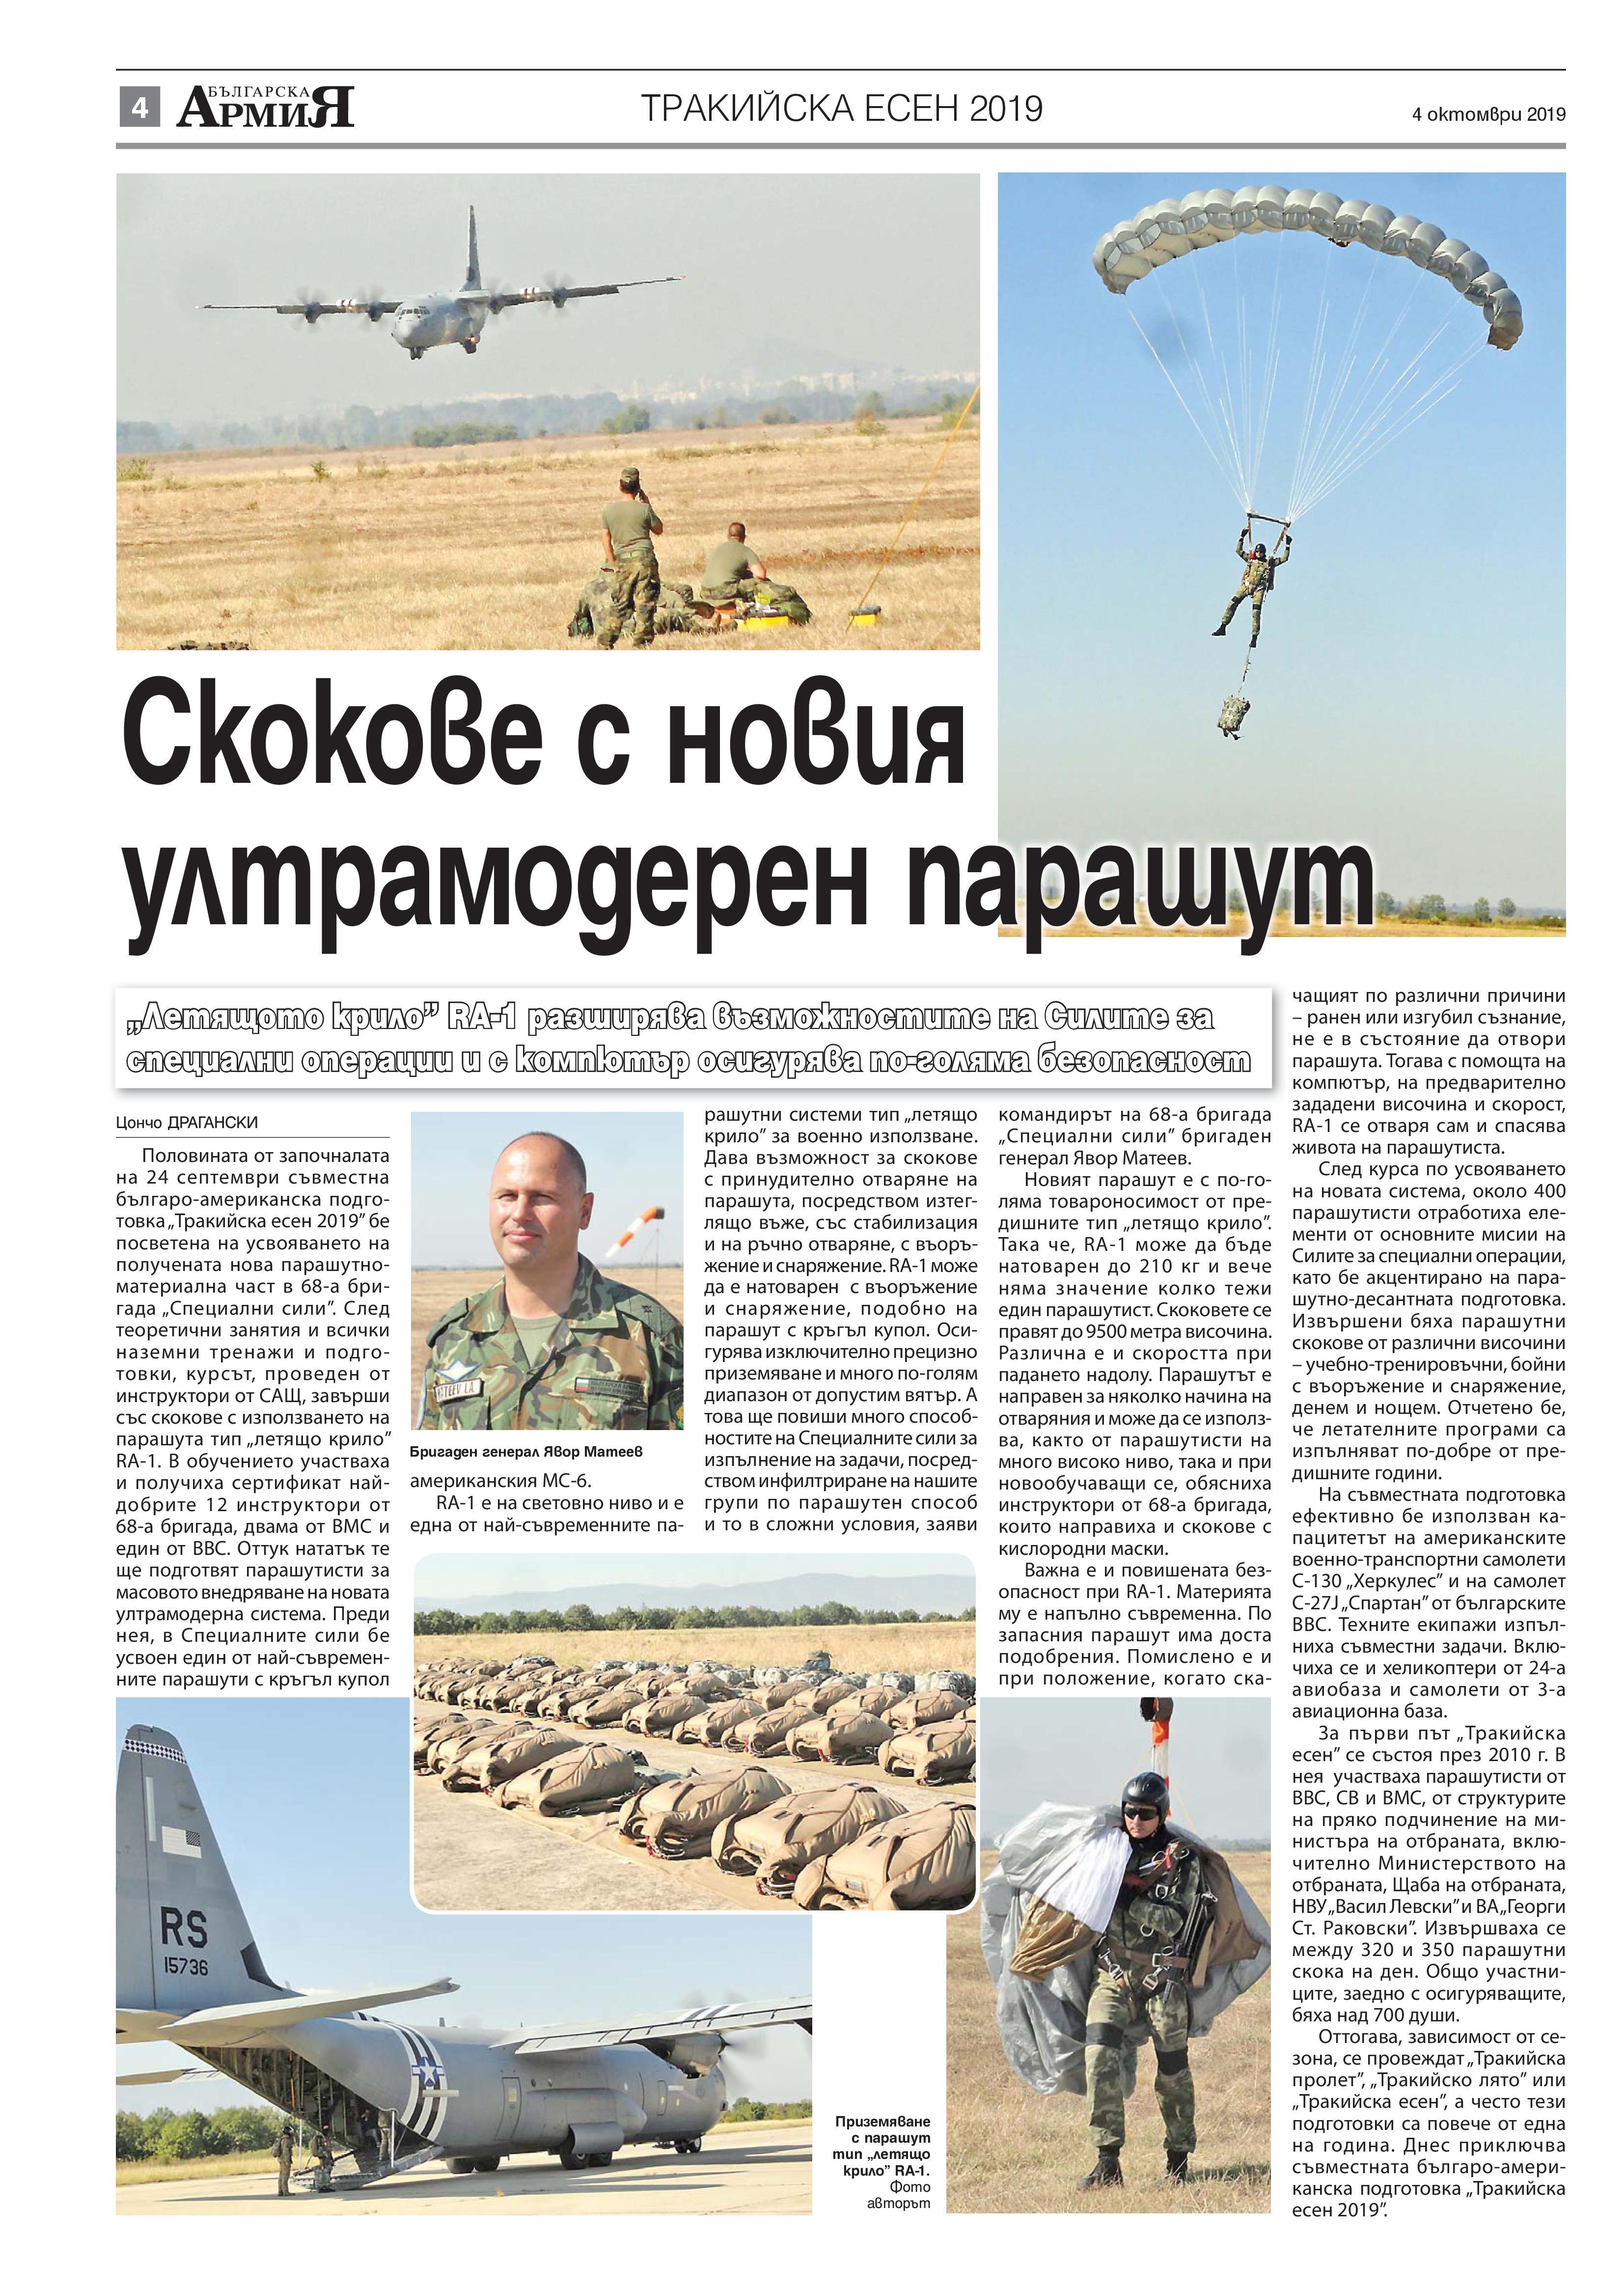 https://armymedia.bg/wp-content/uploads/2015/06/04-32.jpg